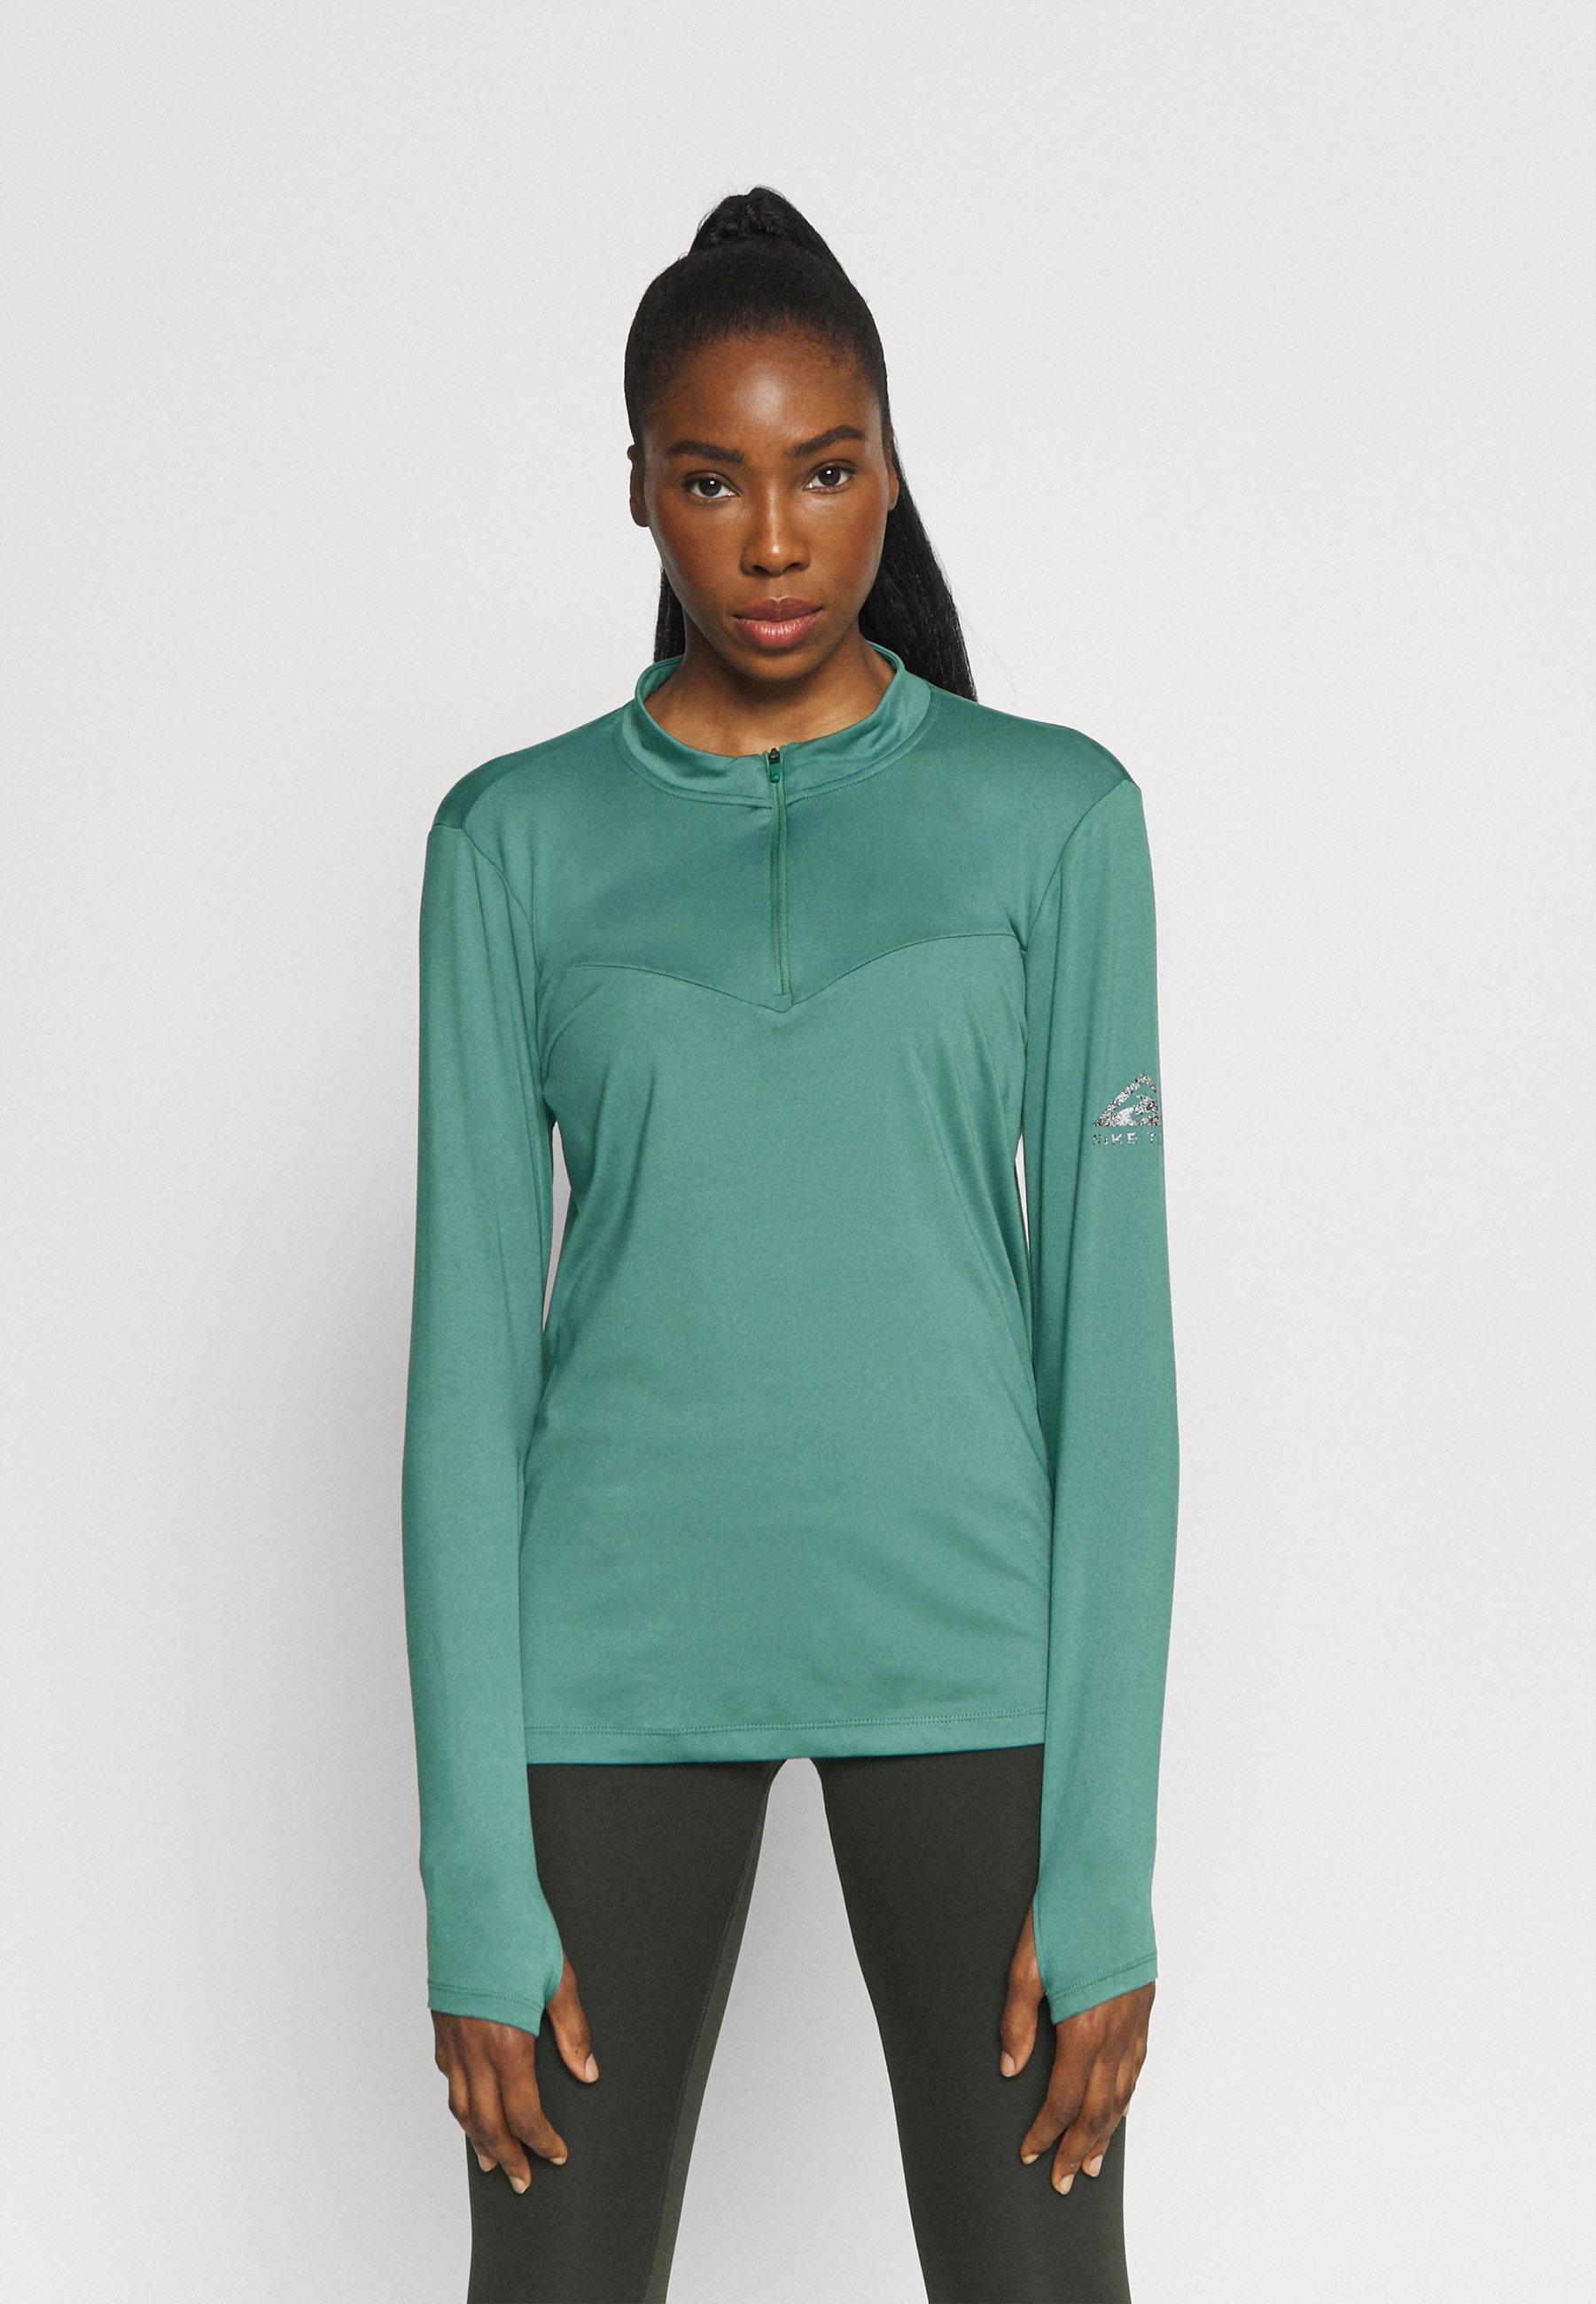 Donna ELEMENT TRAIL MIDLAYER - T-shirt sportiva